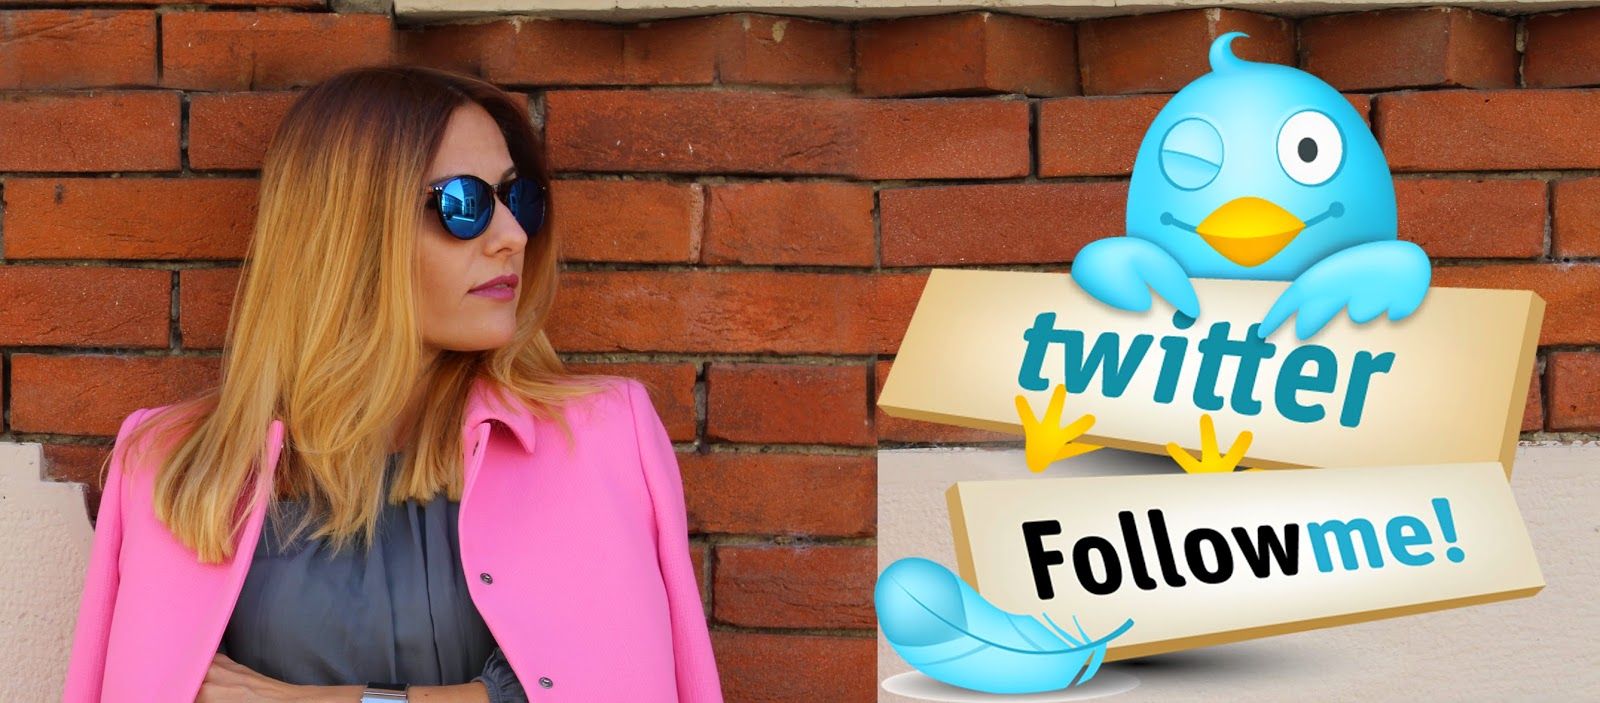 Eniwhere Fashion - Twitter Link